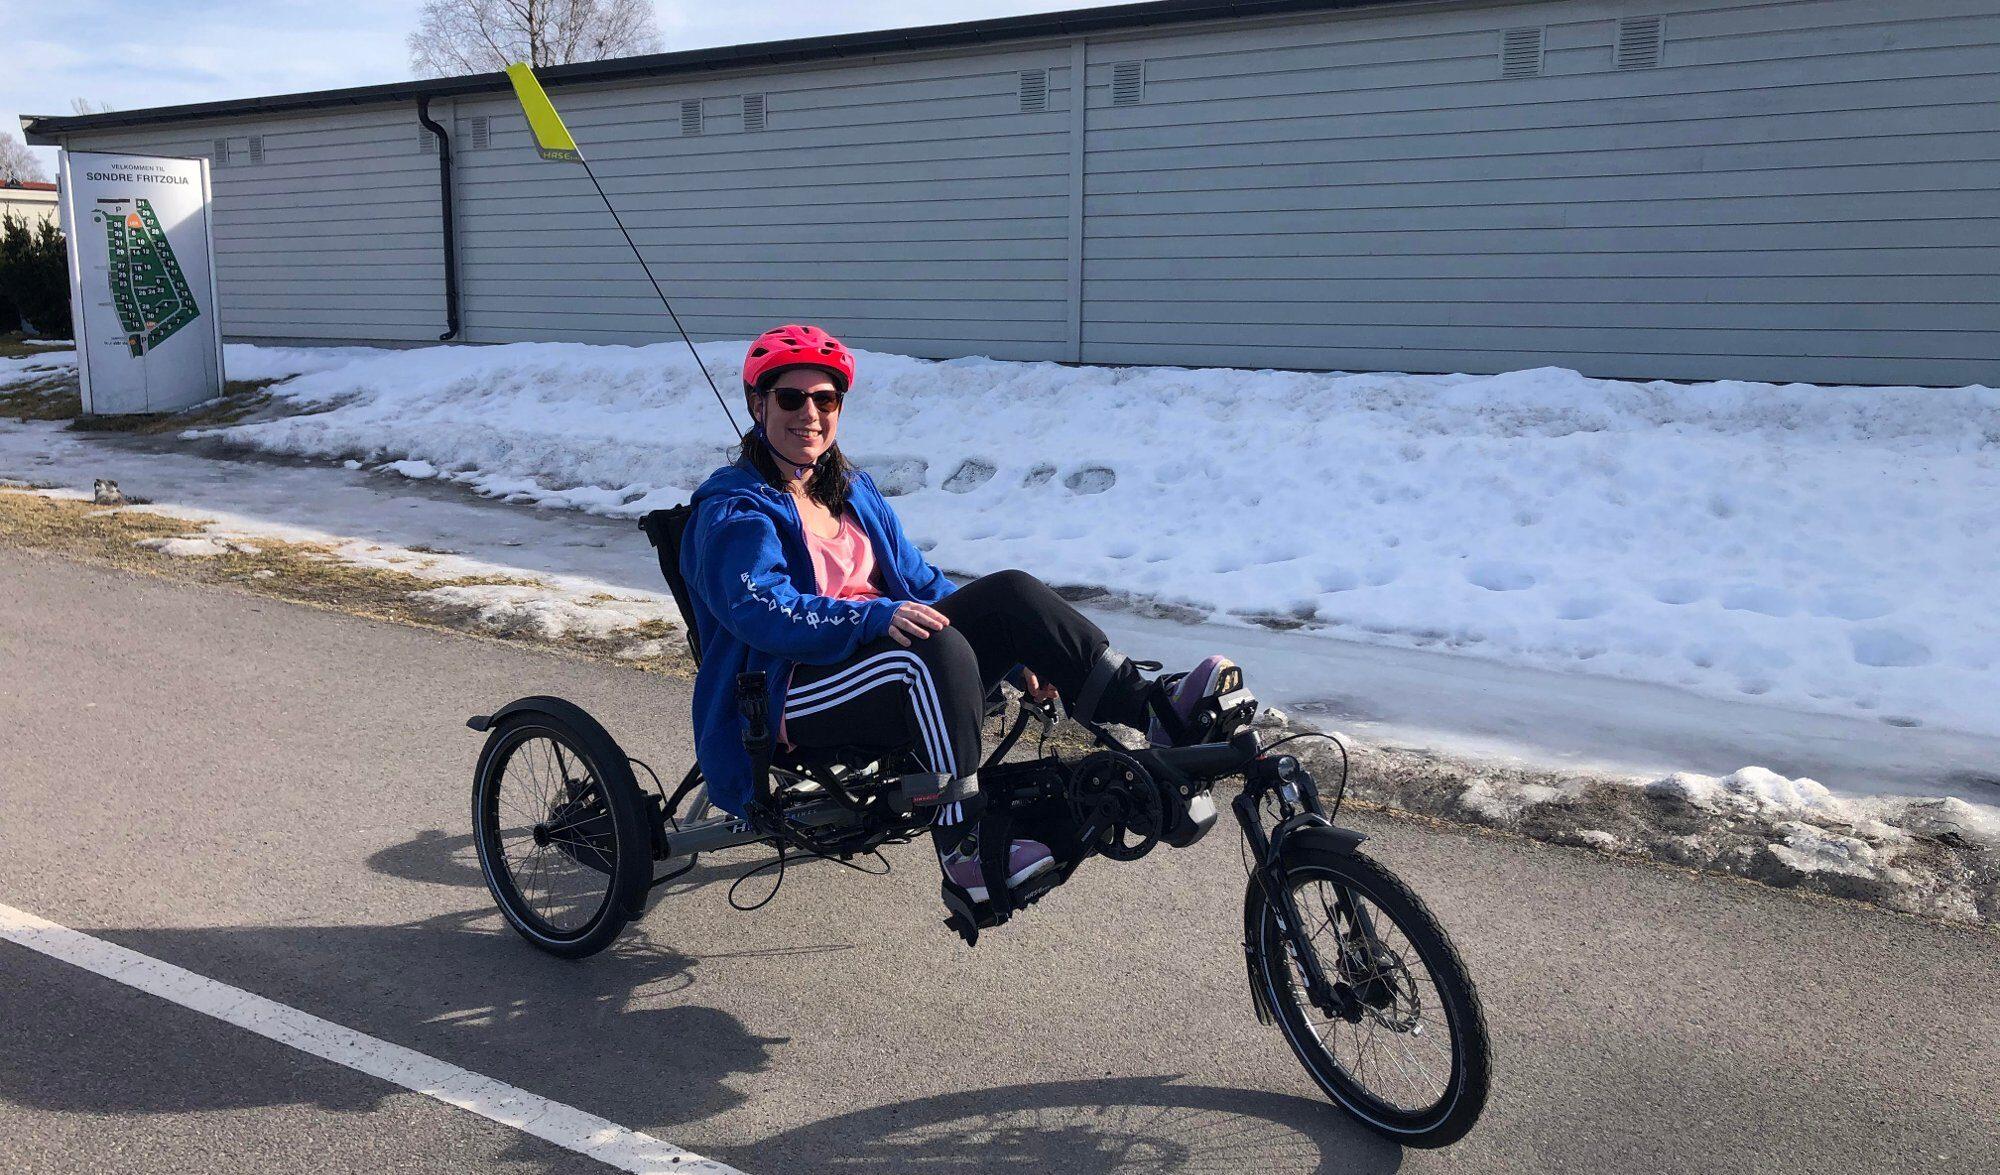 Smilende dame på trehjuls sittesykkel.